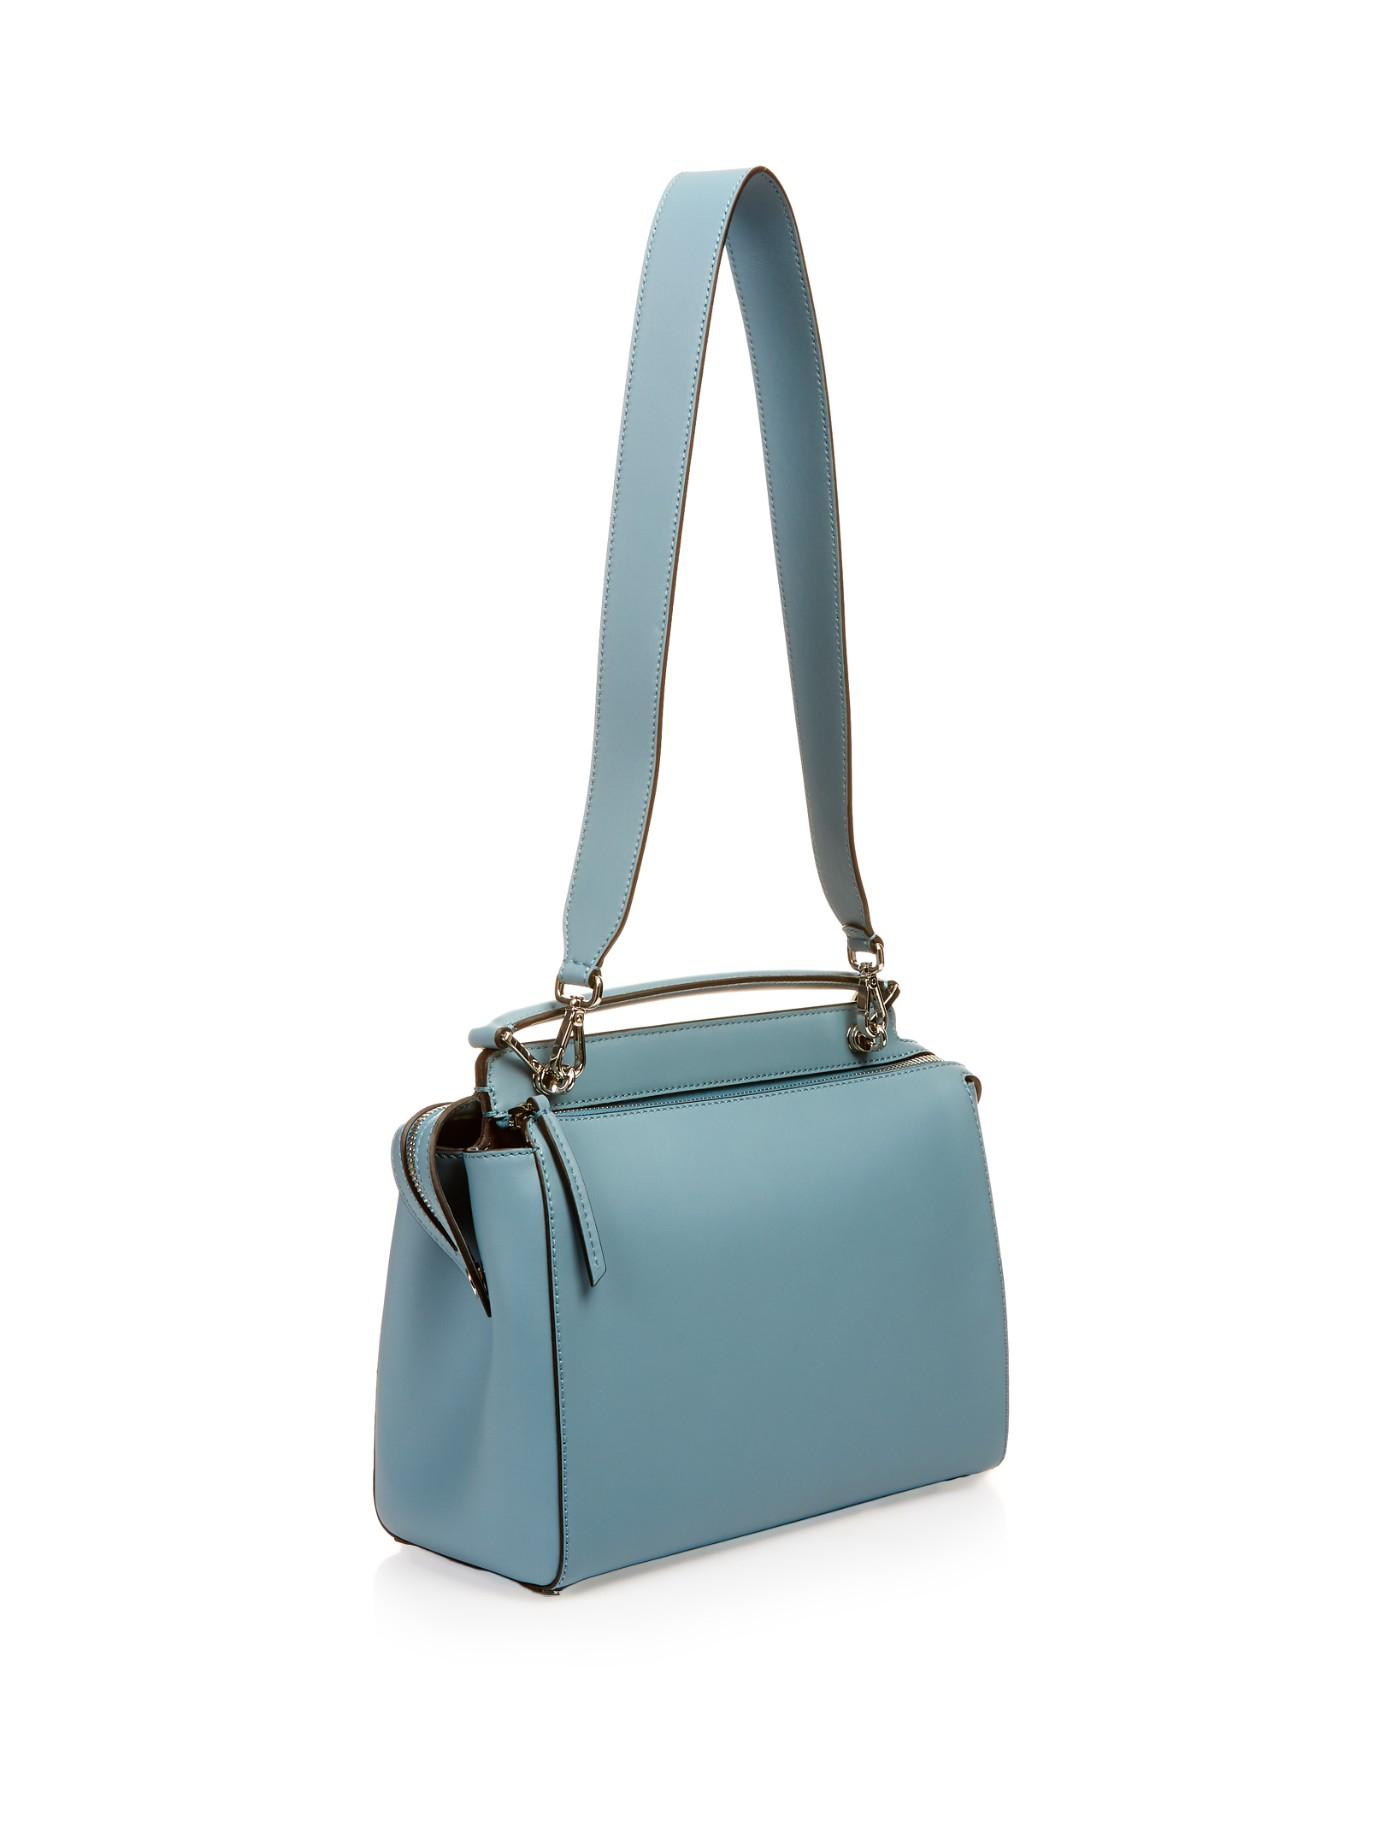 Lyst - Fendi Dotcom Leather Bag in Blue 2e77556279f8e